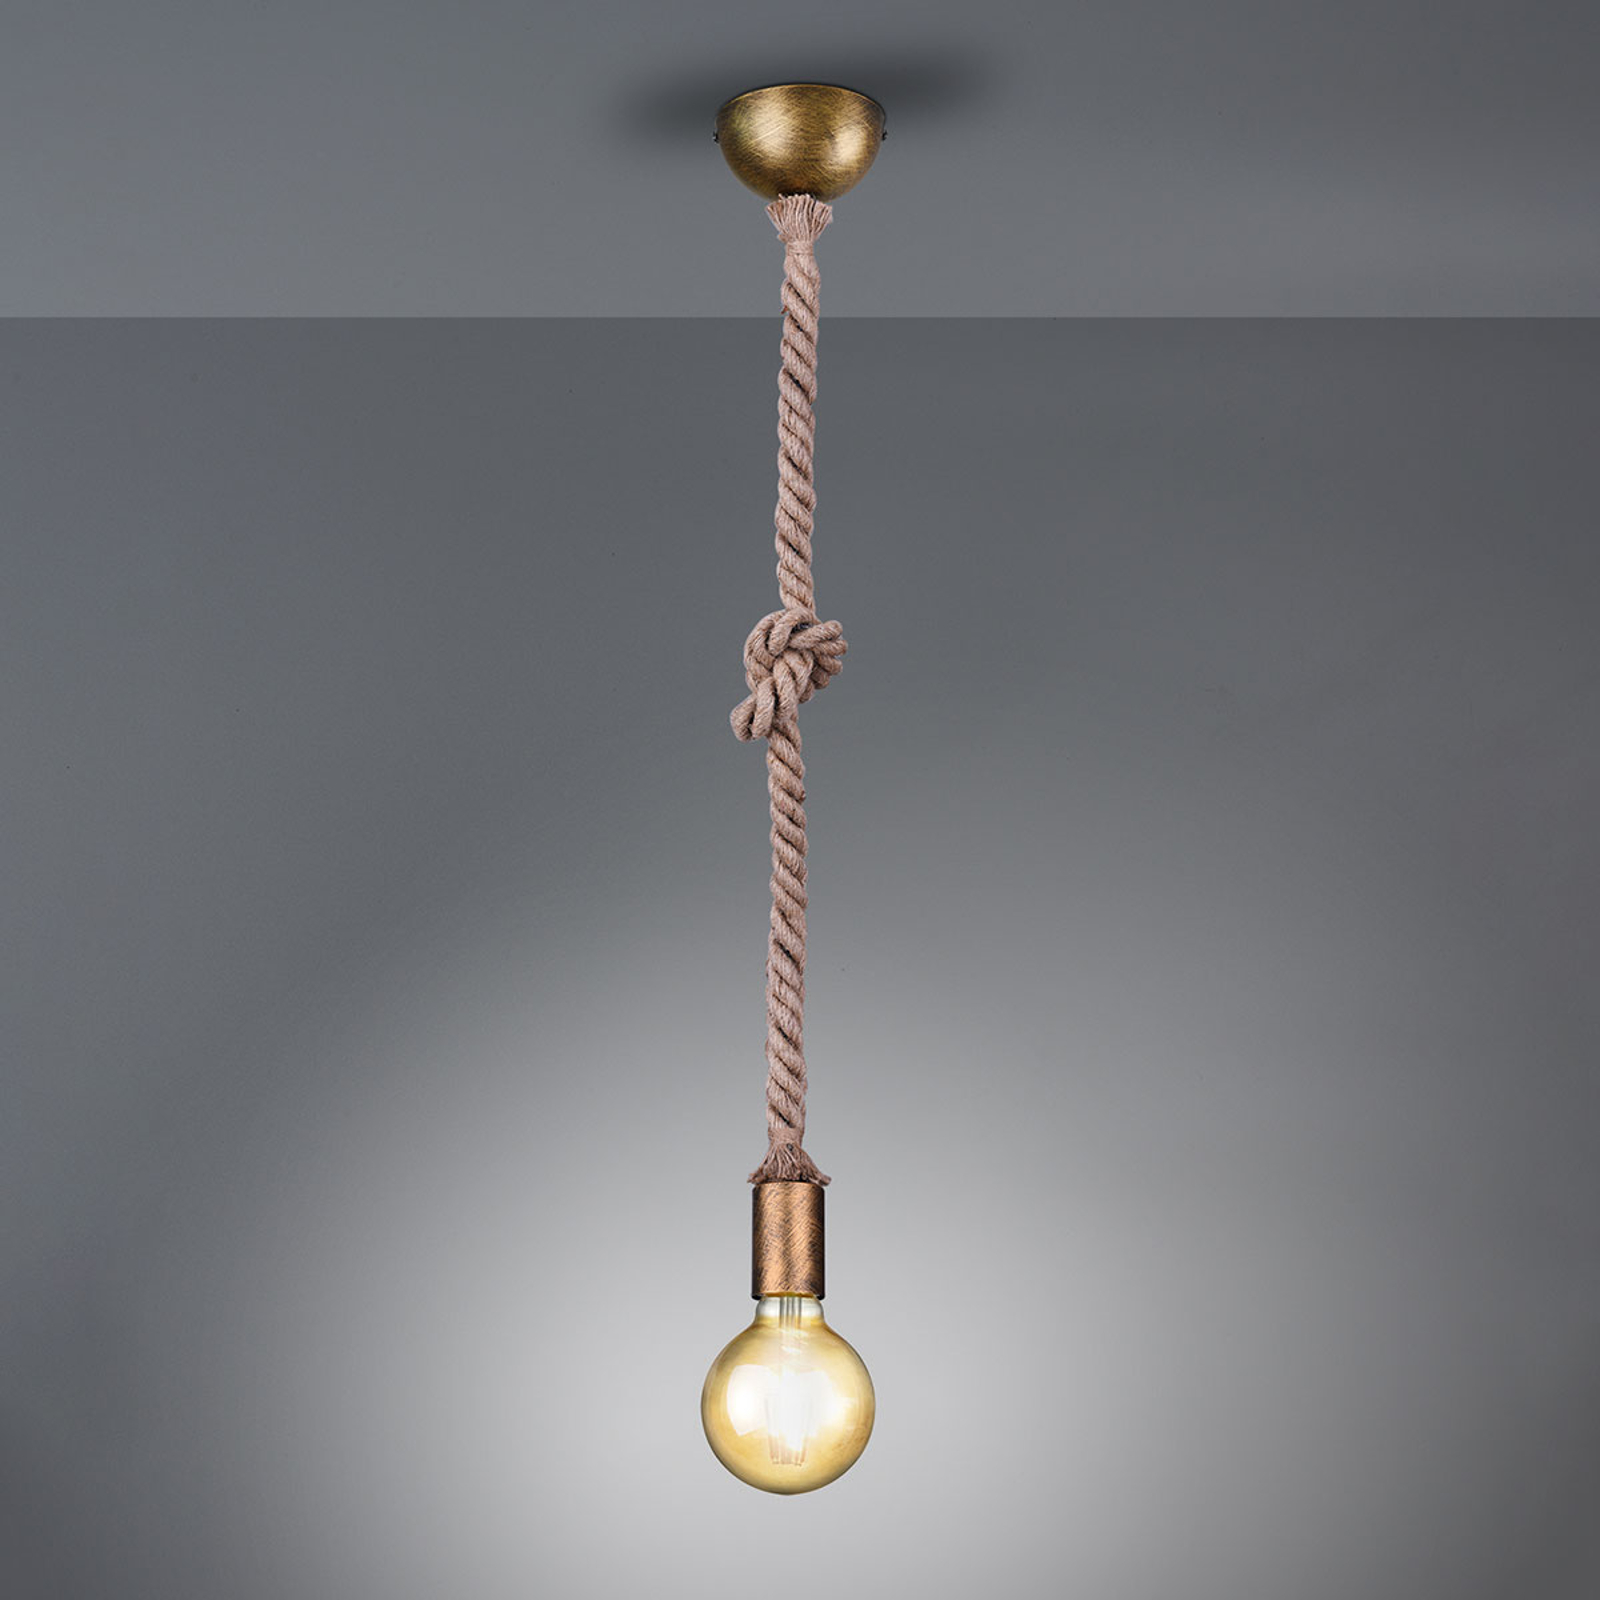 Pendellampe Rope mit dekorativem Seil 1-flammig